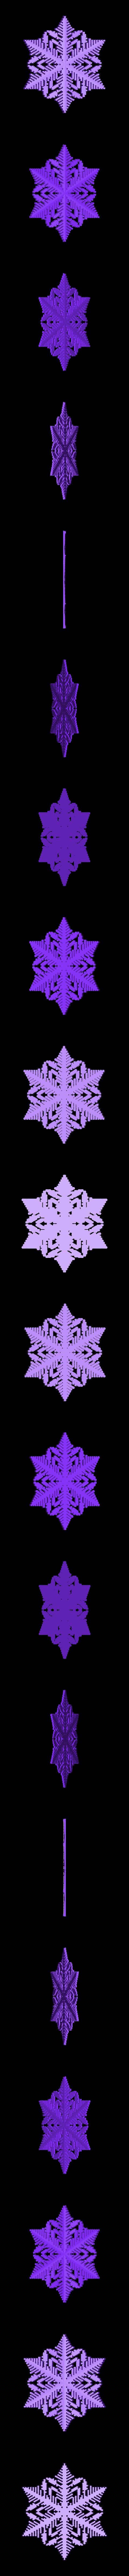 r50-rg3.stl Download free STL file Snowflake growth simulation in BlocksCAD • 3D printing design, arpruss